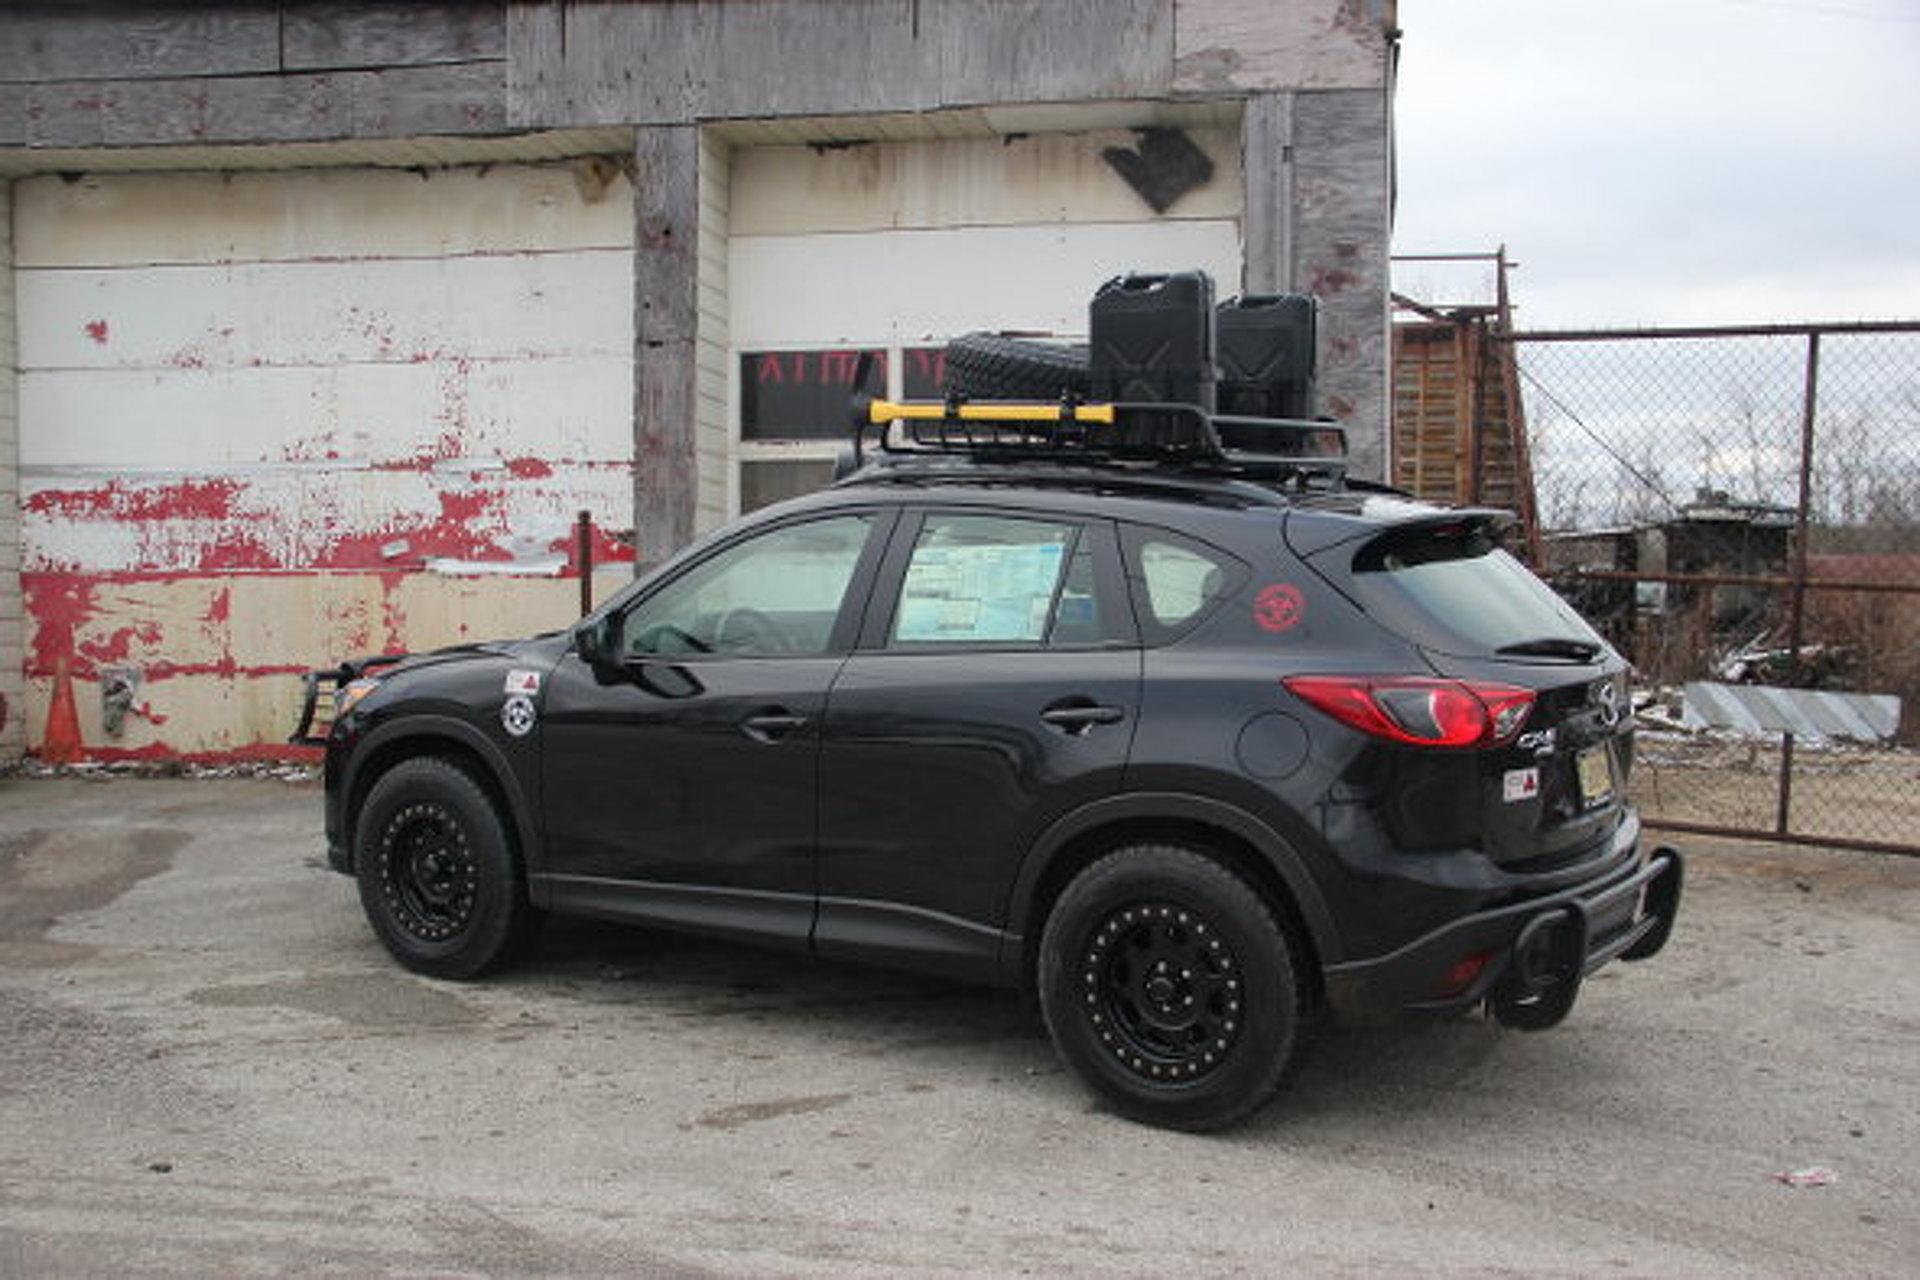 Cj Wilson Mazda >> CJ Wilson's Zombie-Proof Mazda CX-5